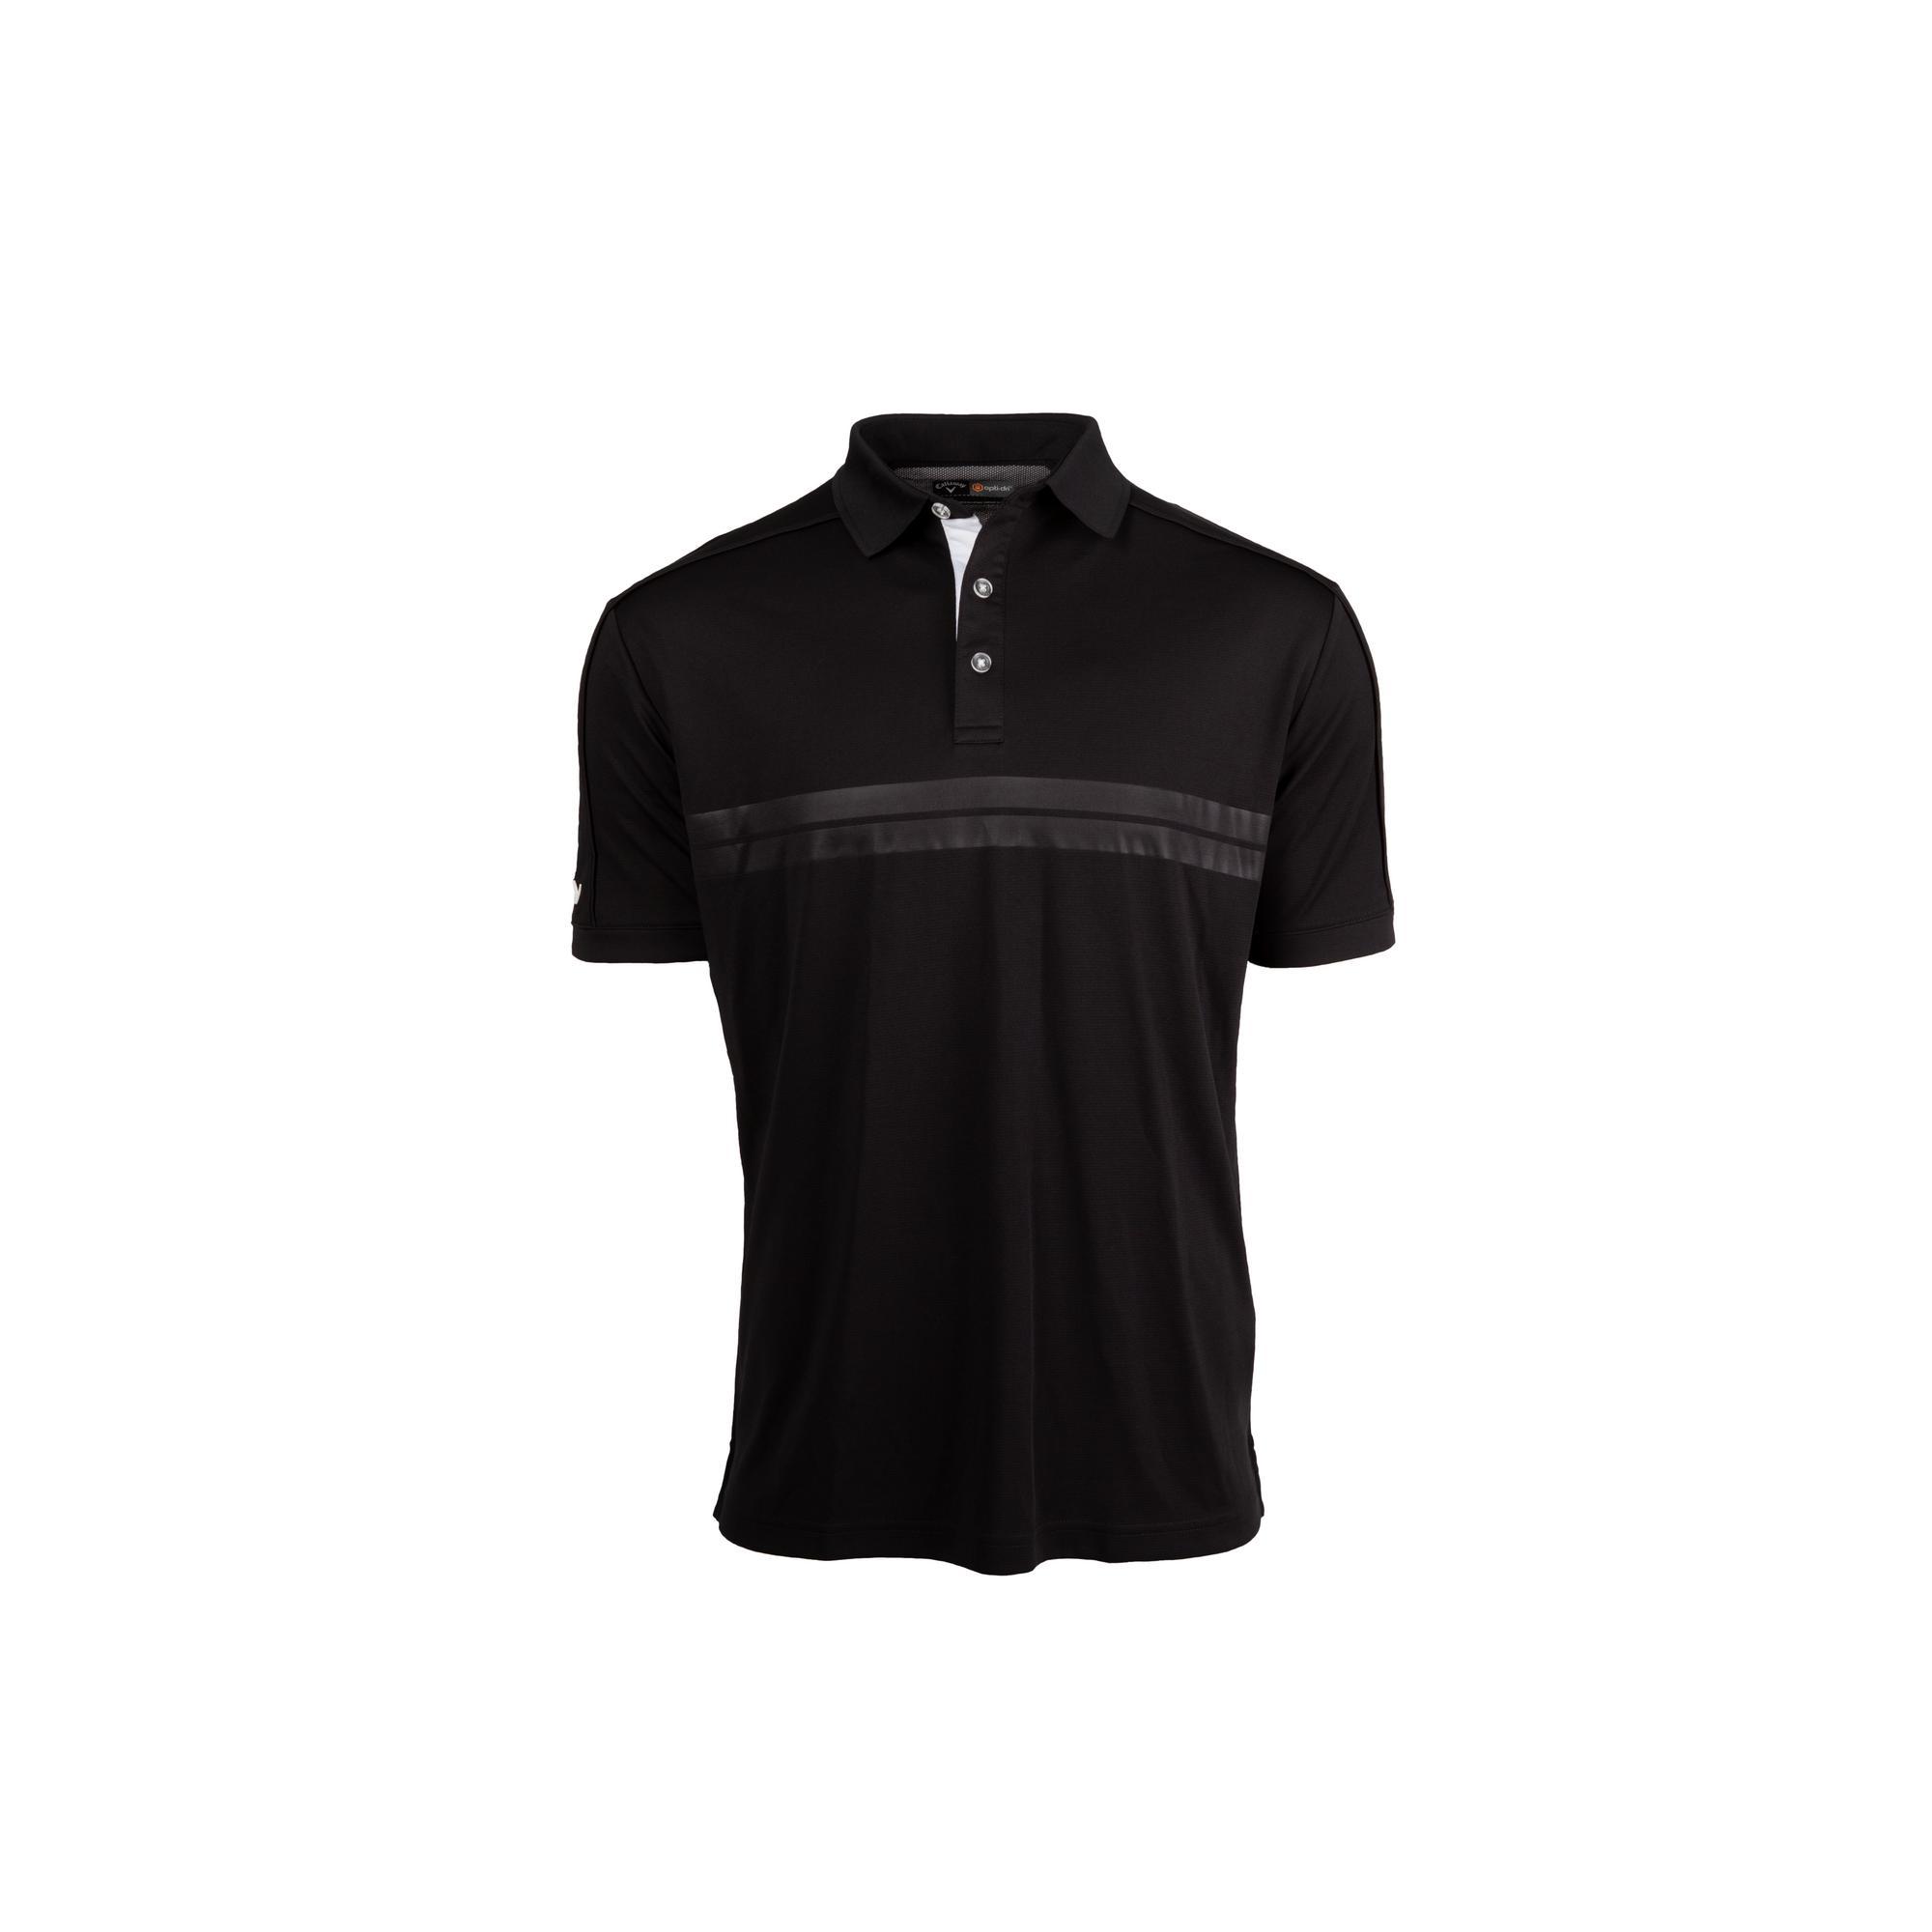 Men's Embossed Athletic Short Sleeve Shirt